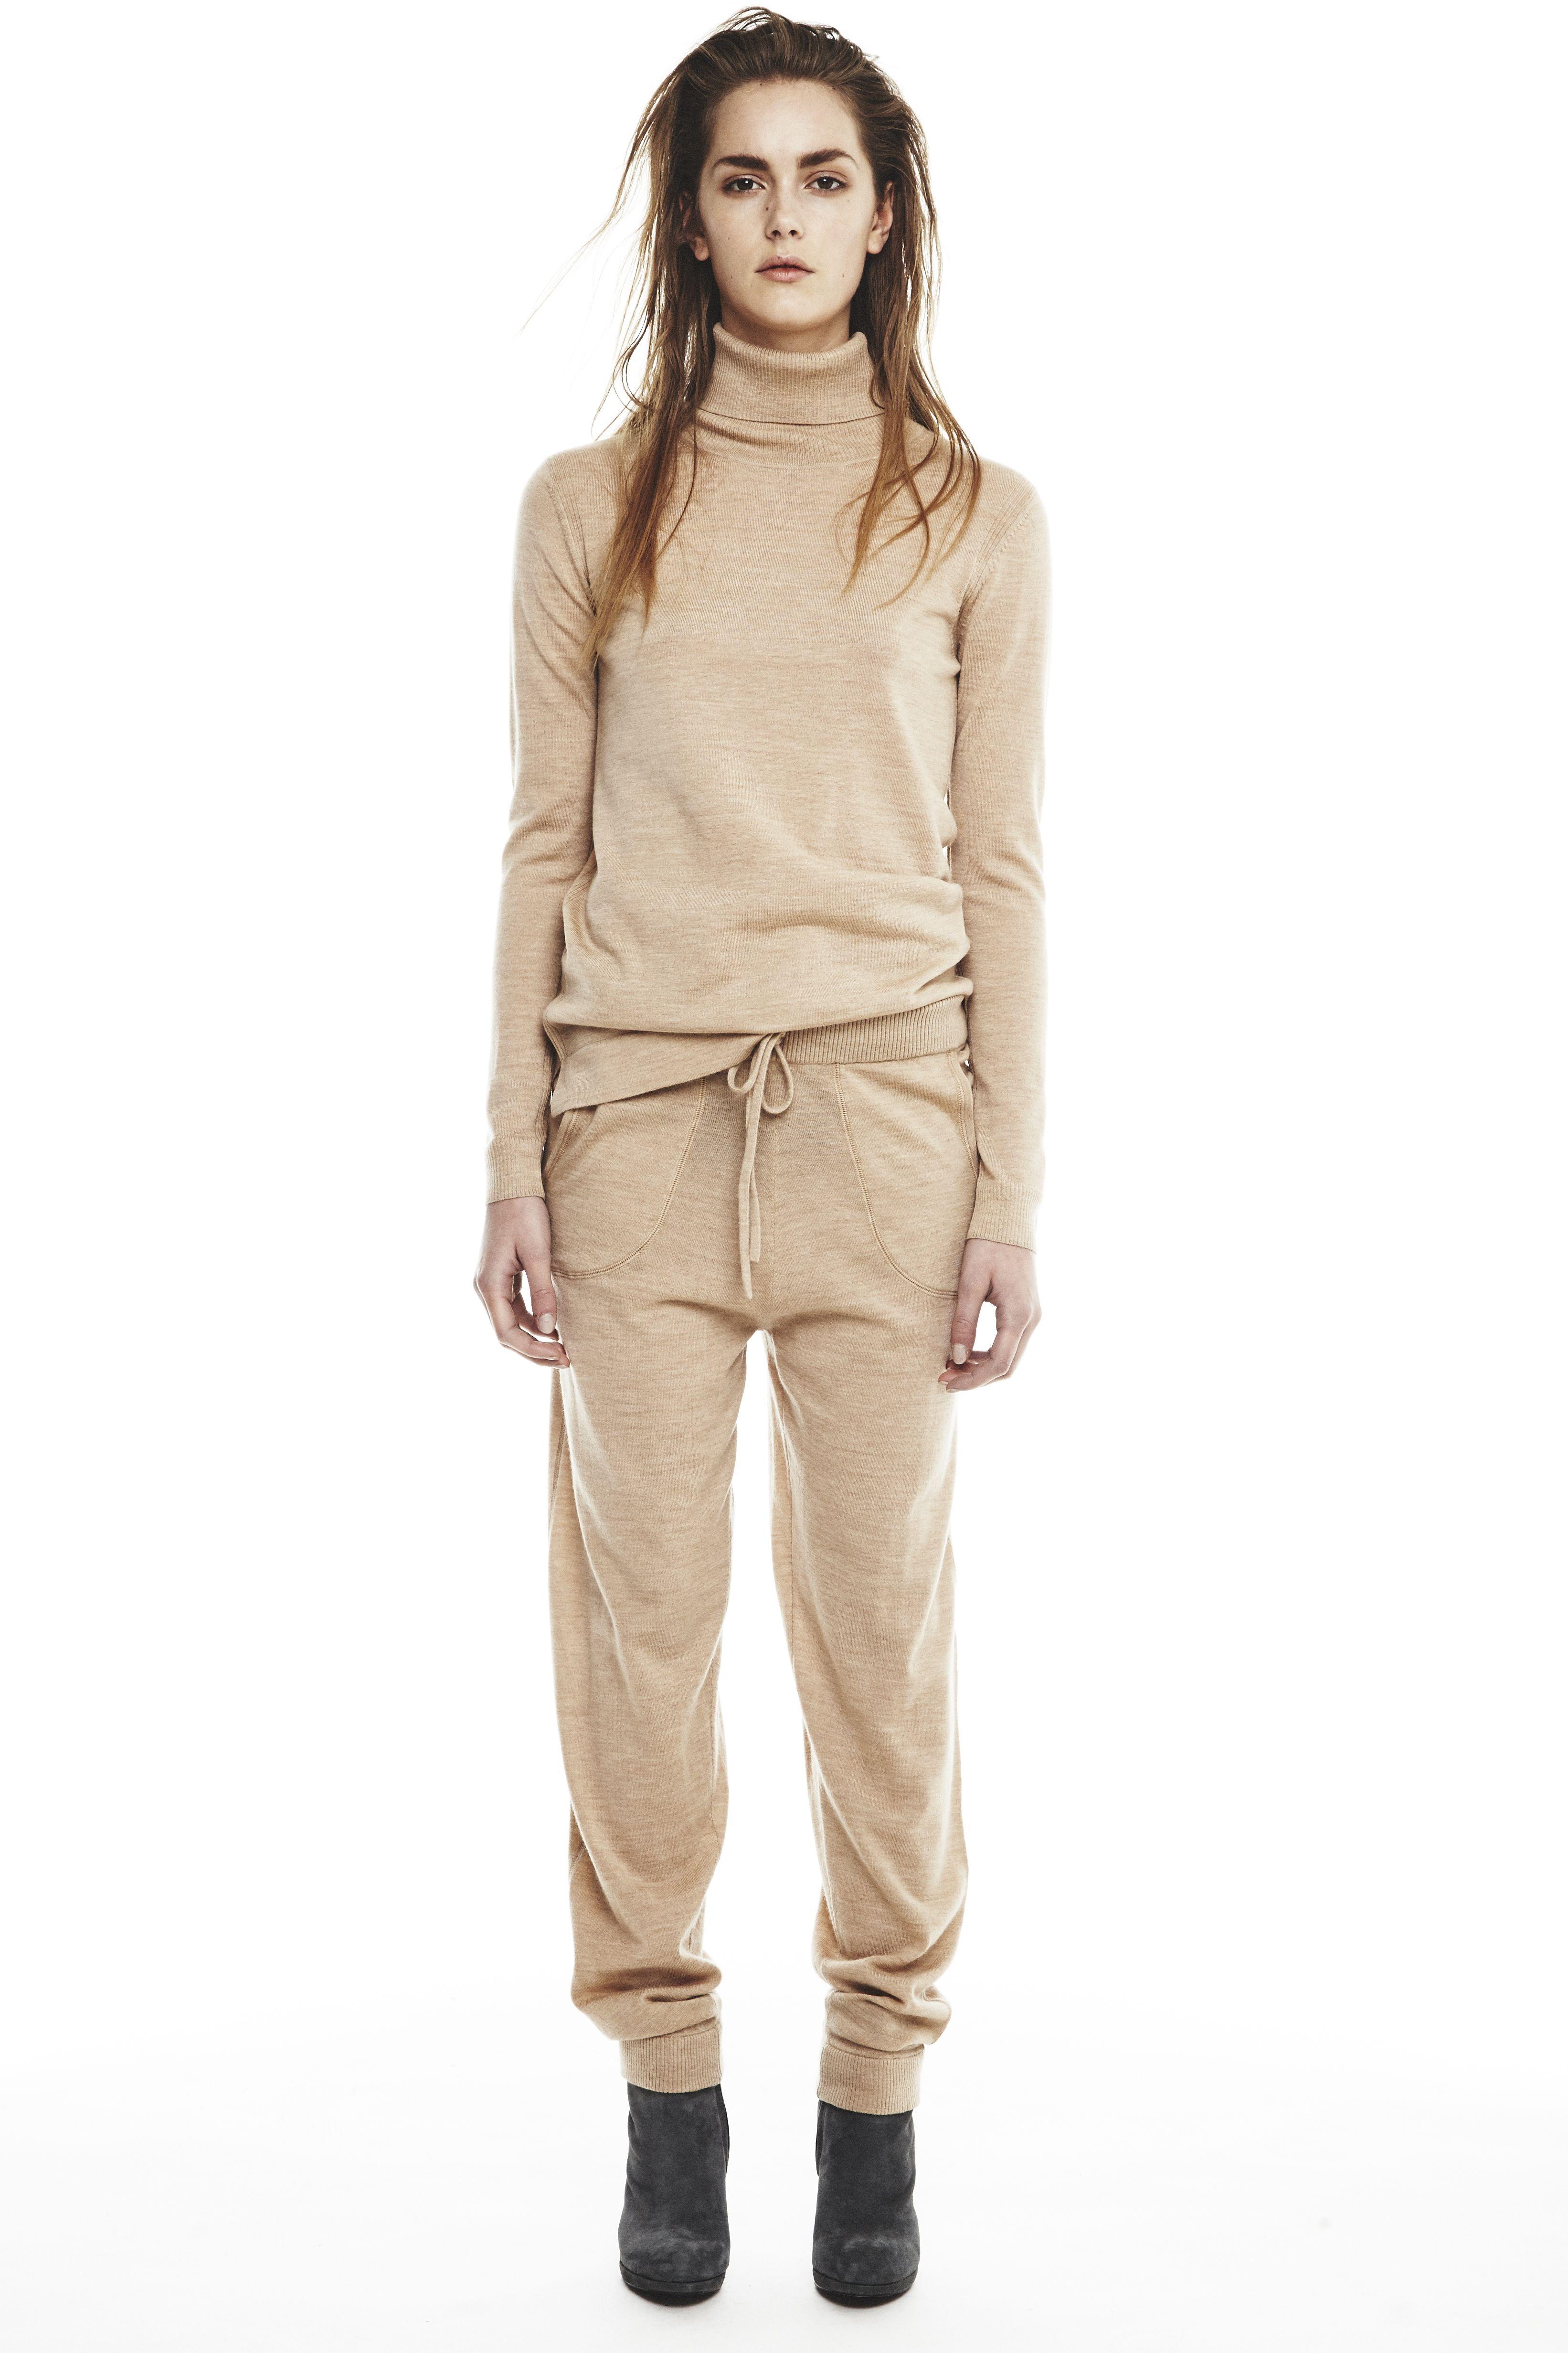 House of Dagmar AW15 I Annabella merino roll neck sweater new & Amali merino trouser new